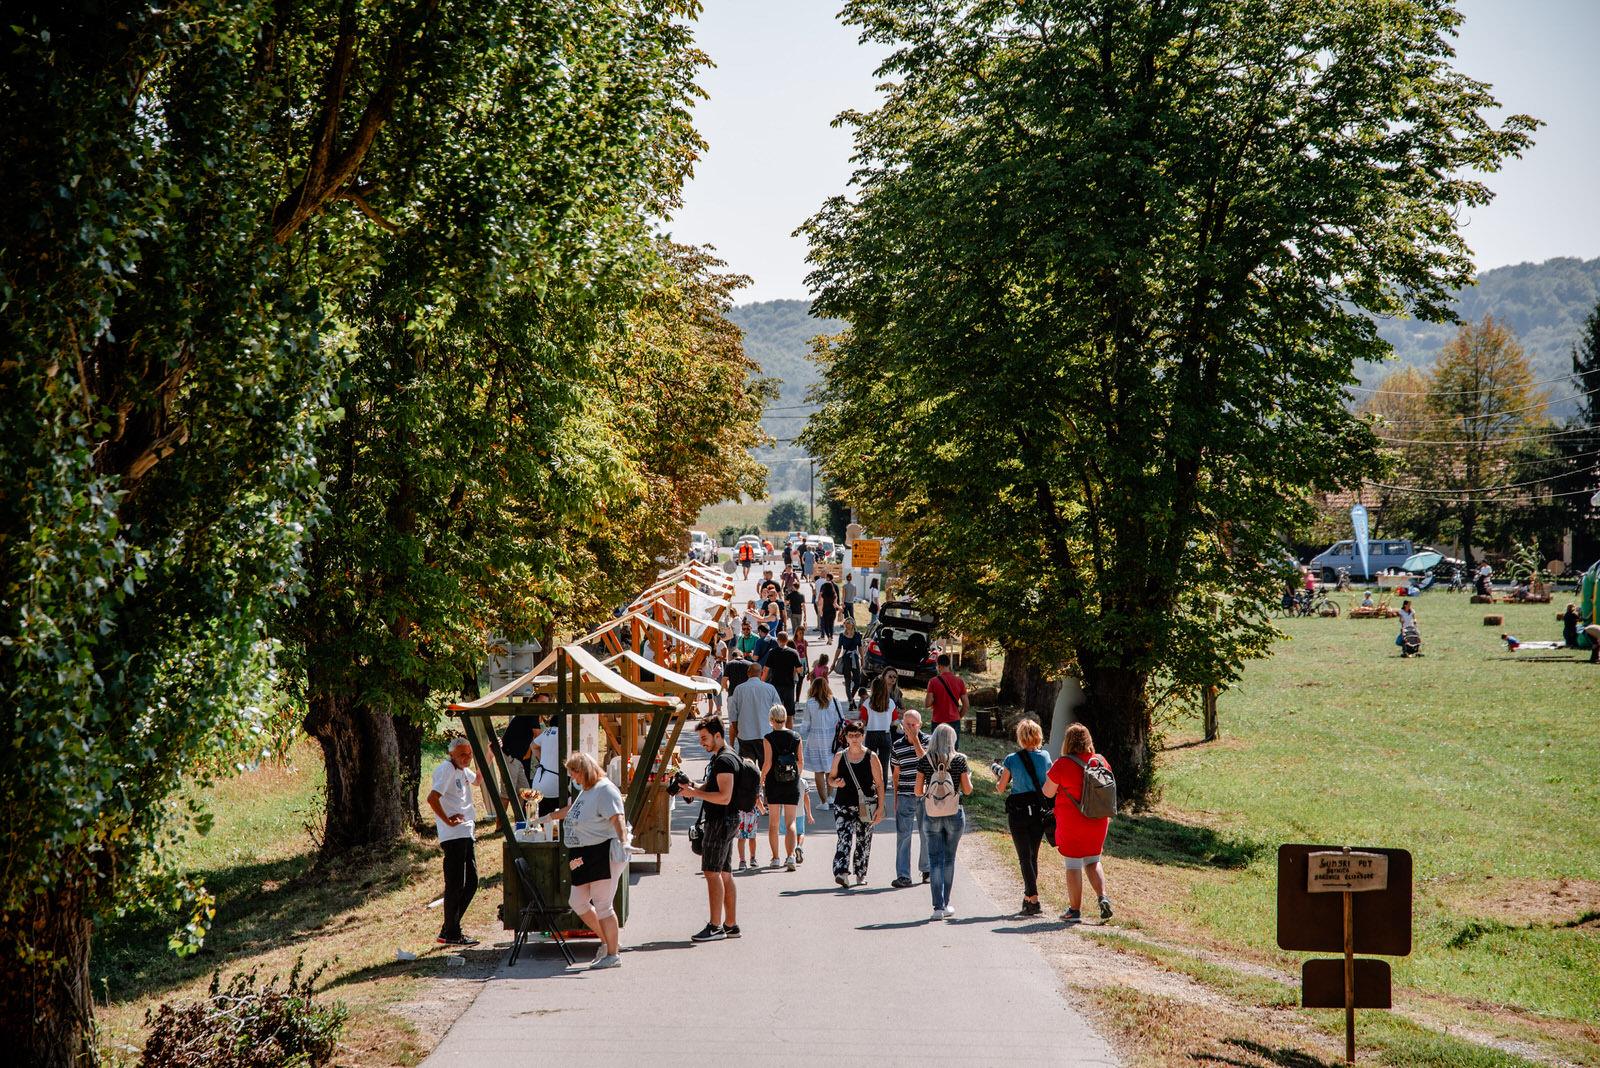 likaclub_jaškovo_štrudlafest 20205_9_2020 (53)